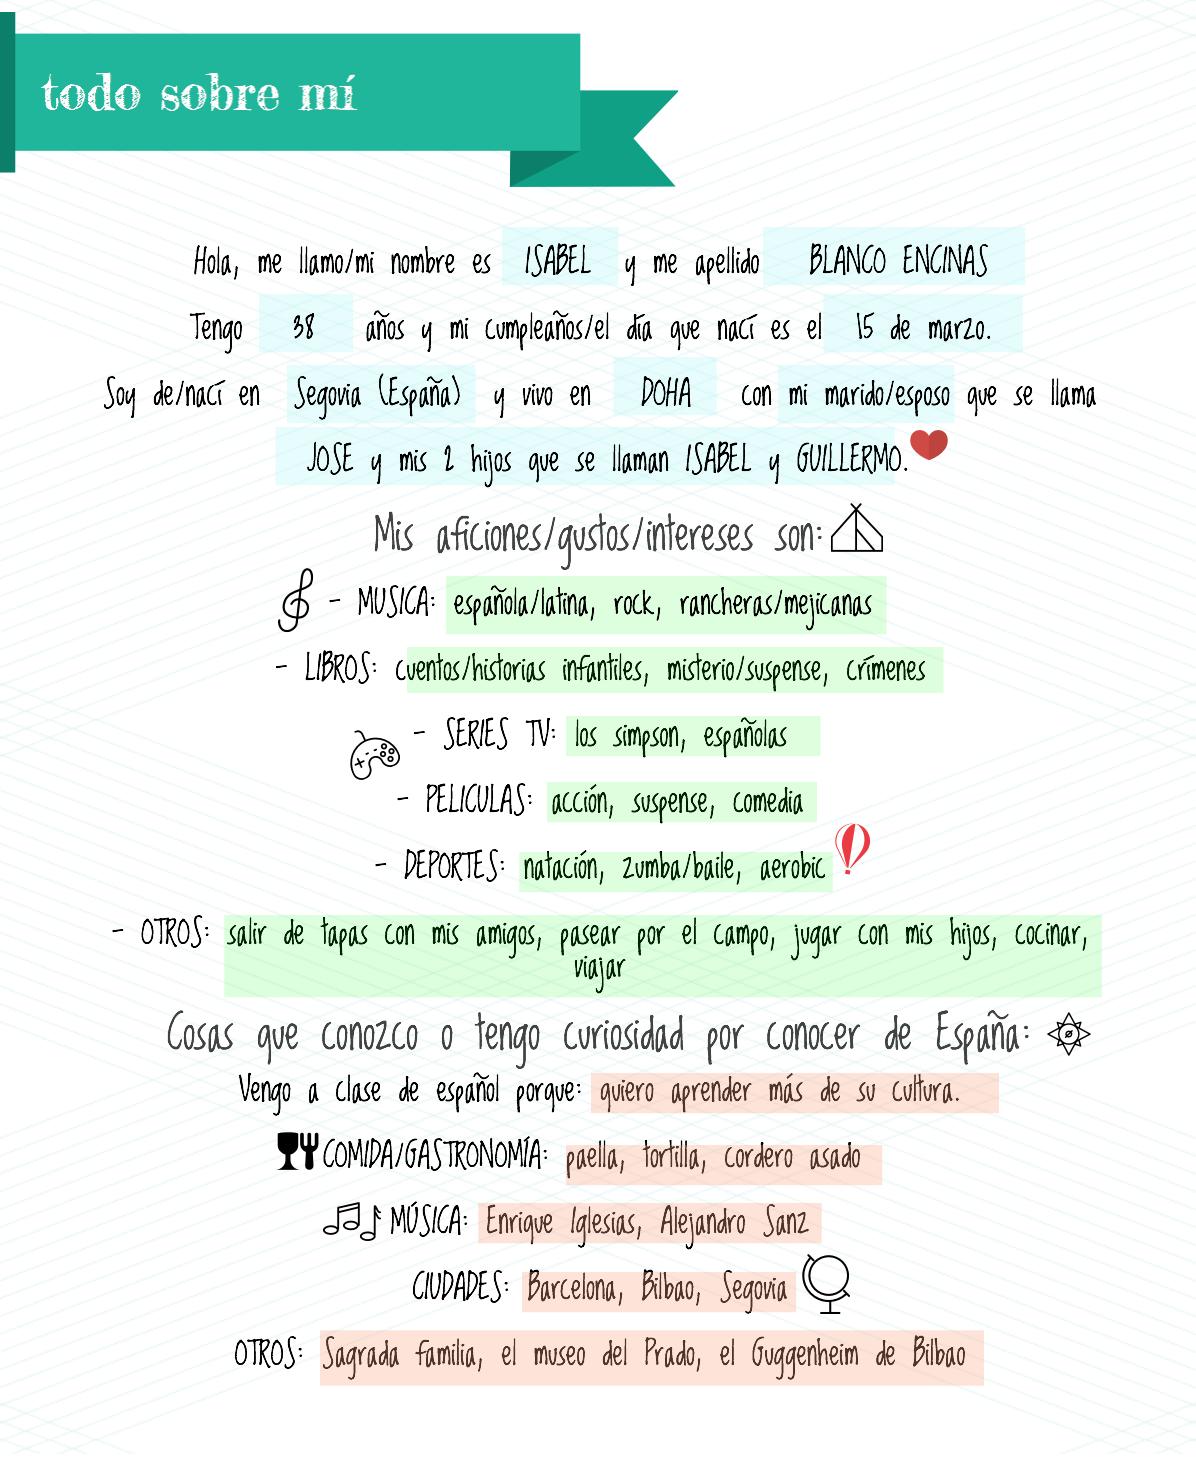 trabajar información personal en clase de idiomas. Todo sobre mi clase de ELE #teachmorespanish #profedeele